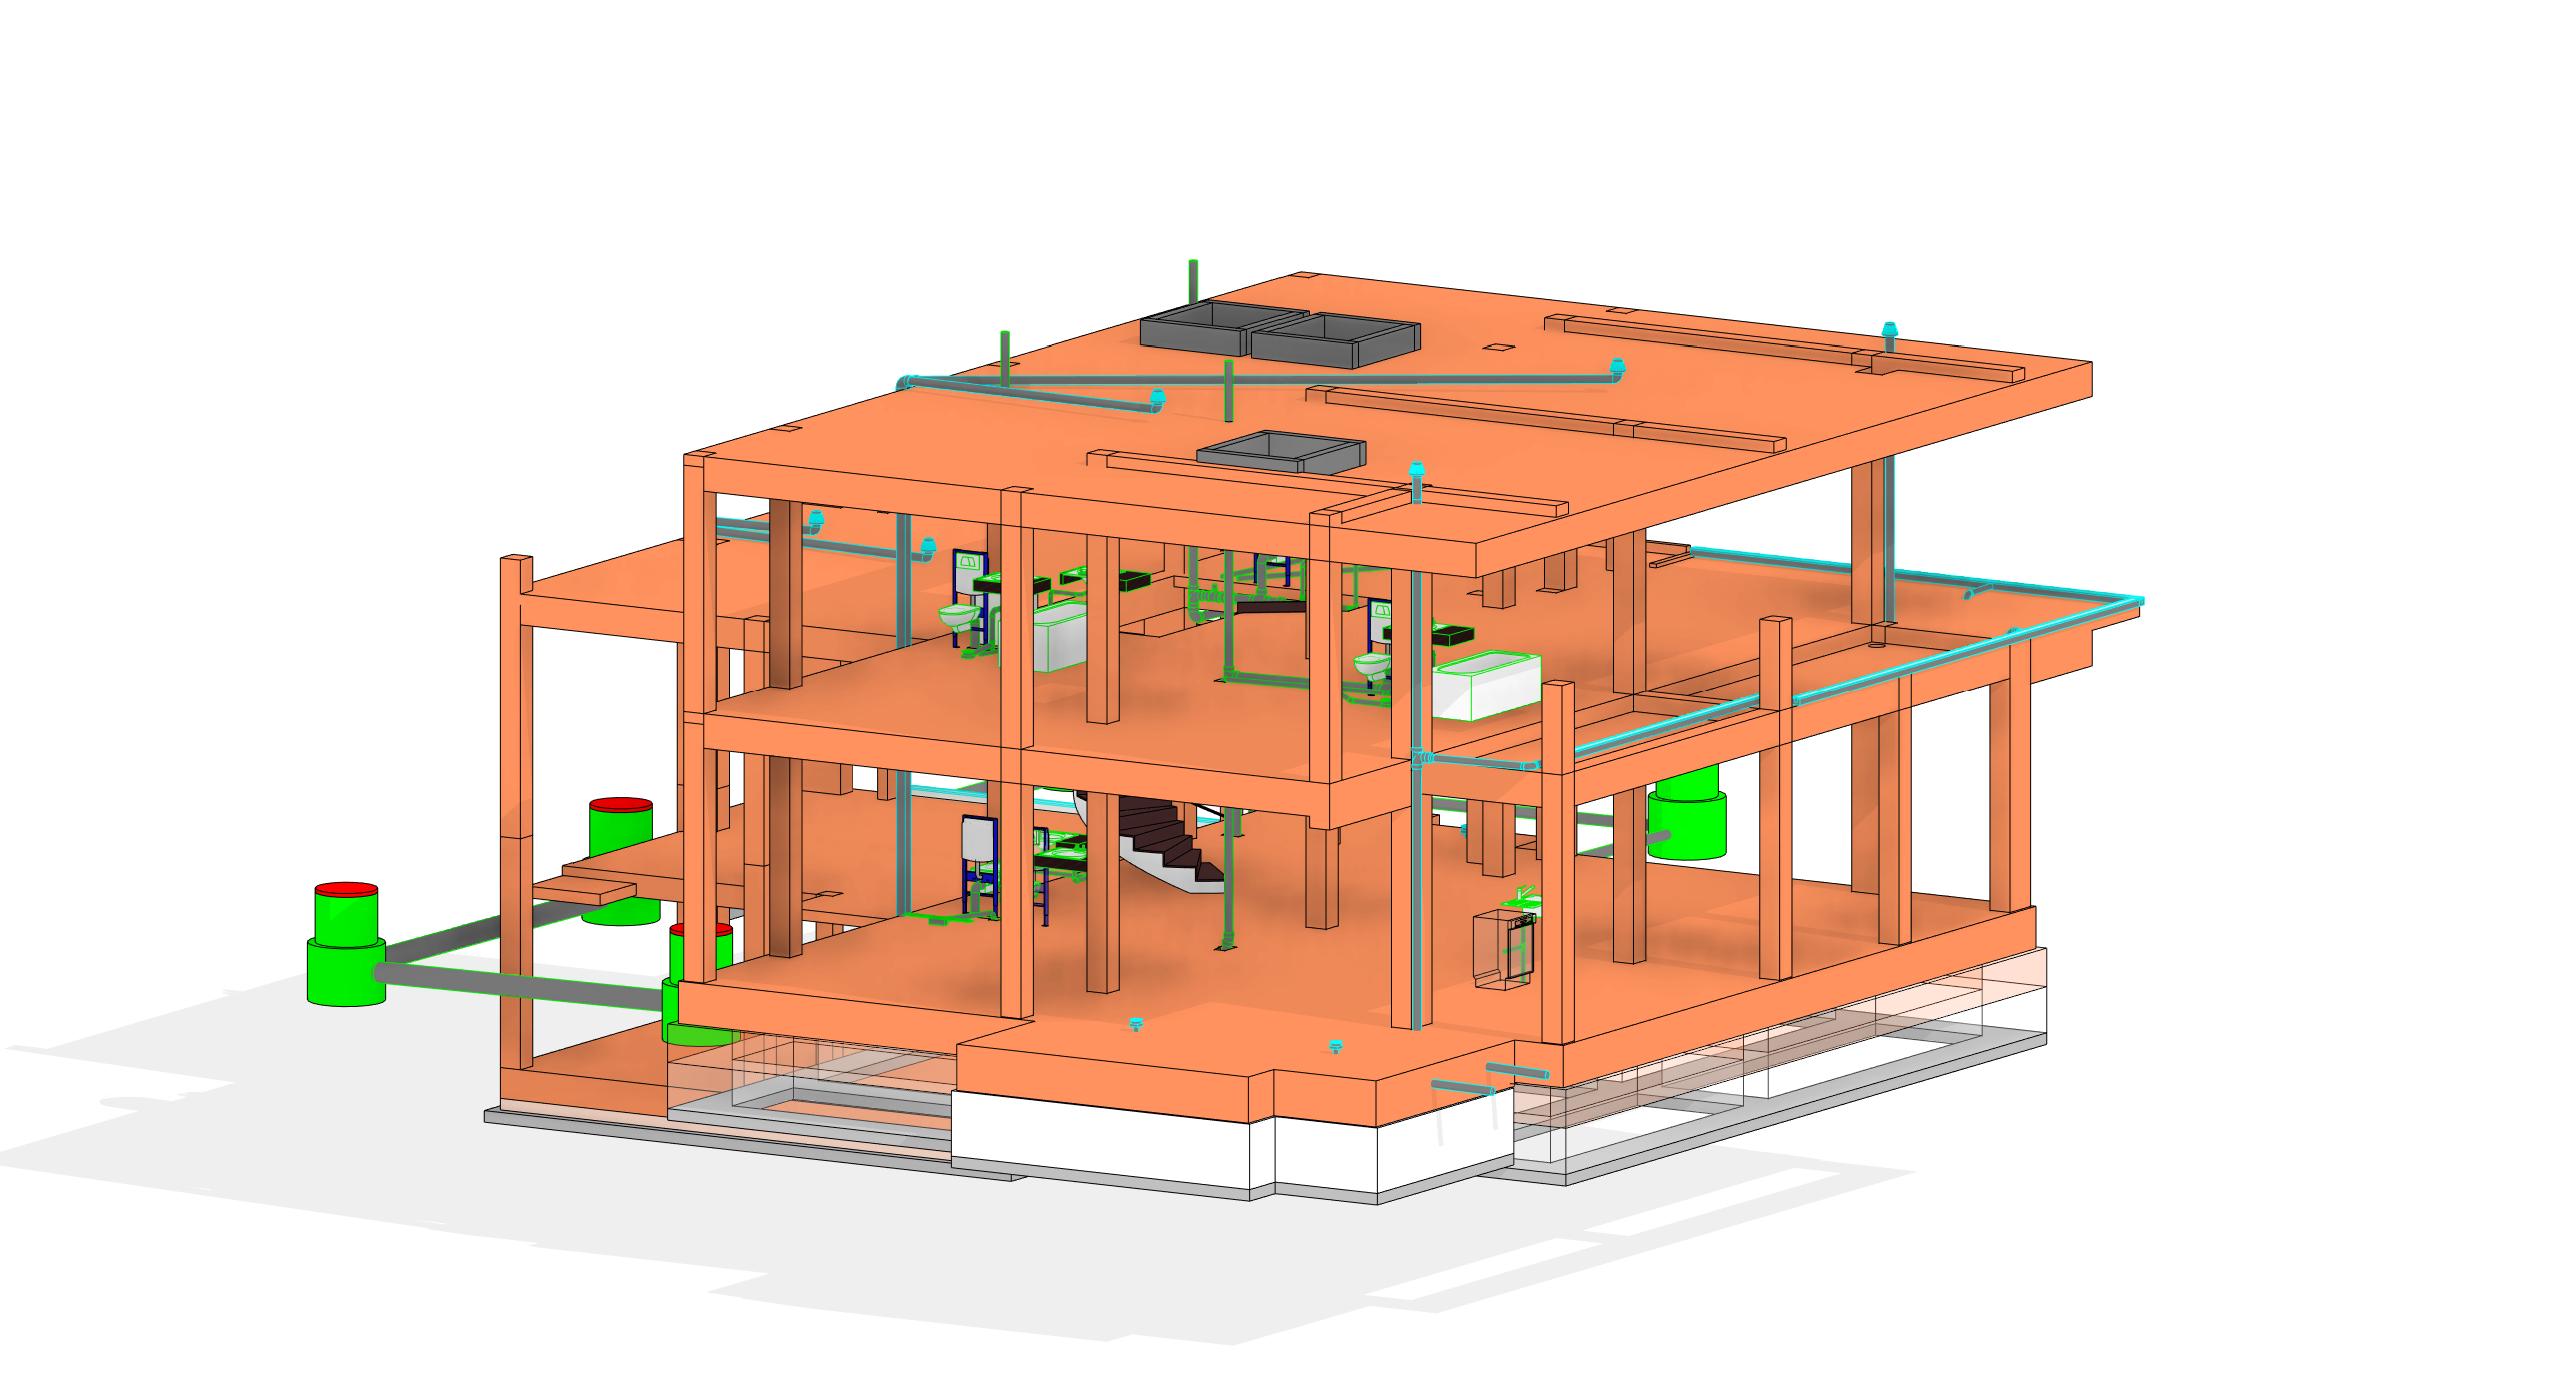 structura si instalatii 3d